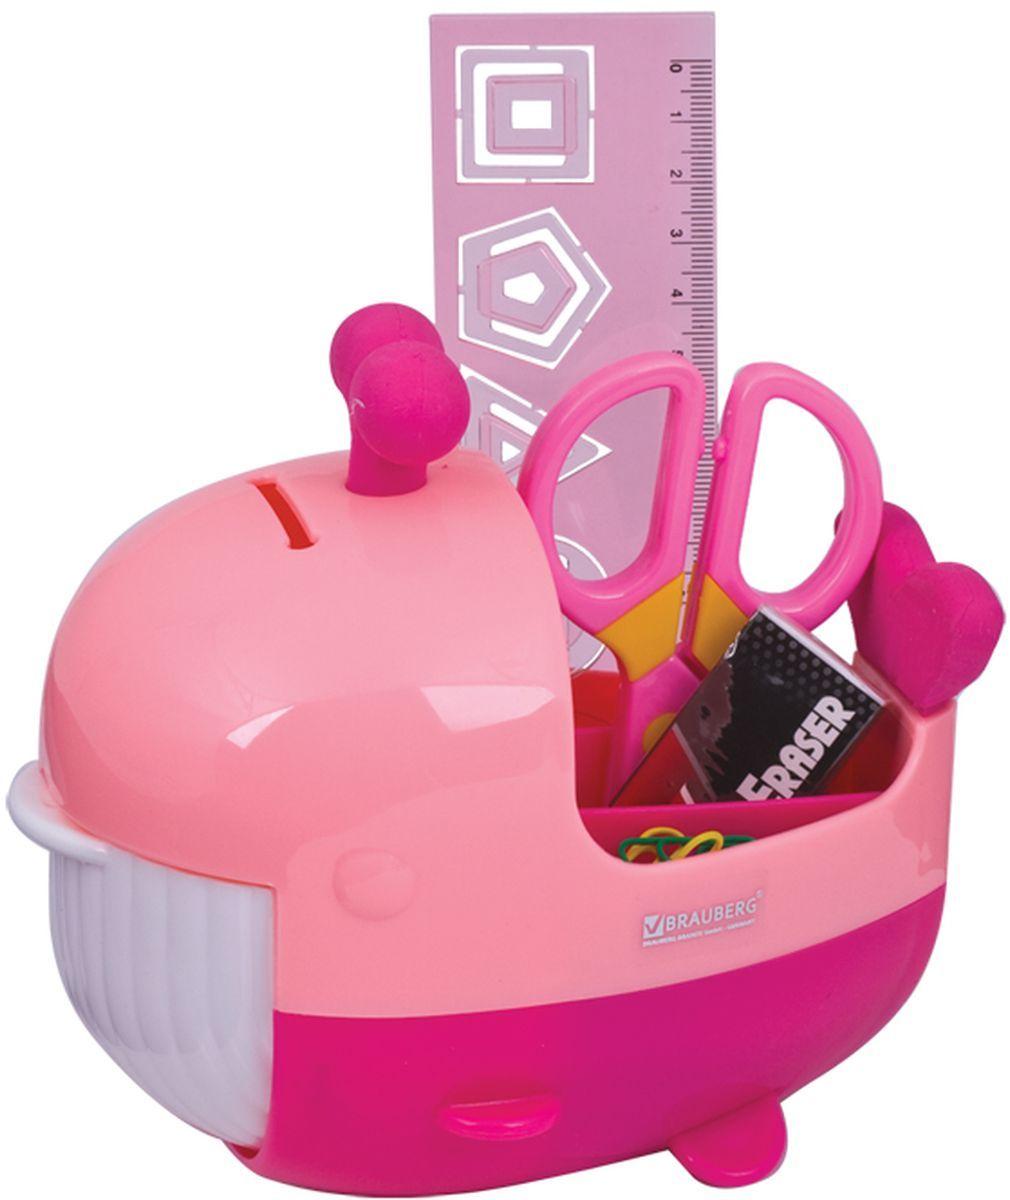 Brauberg Канцелярский набор Кит цвет розовый 4 предмета 231935